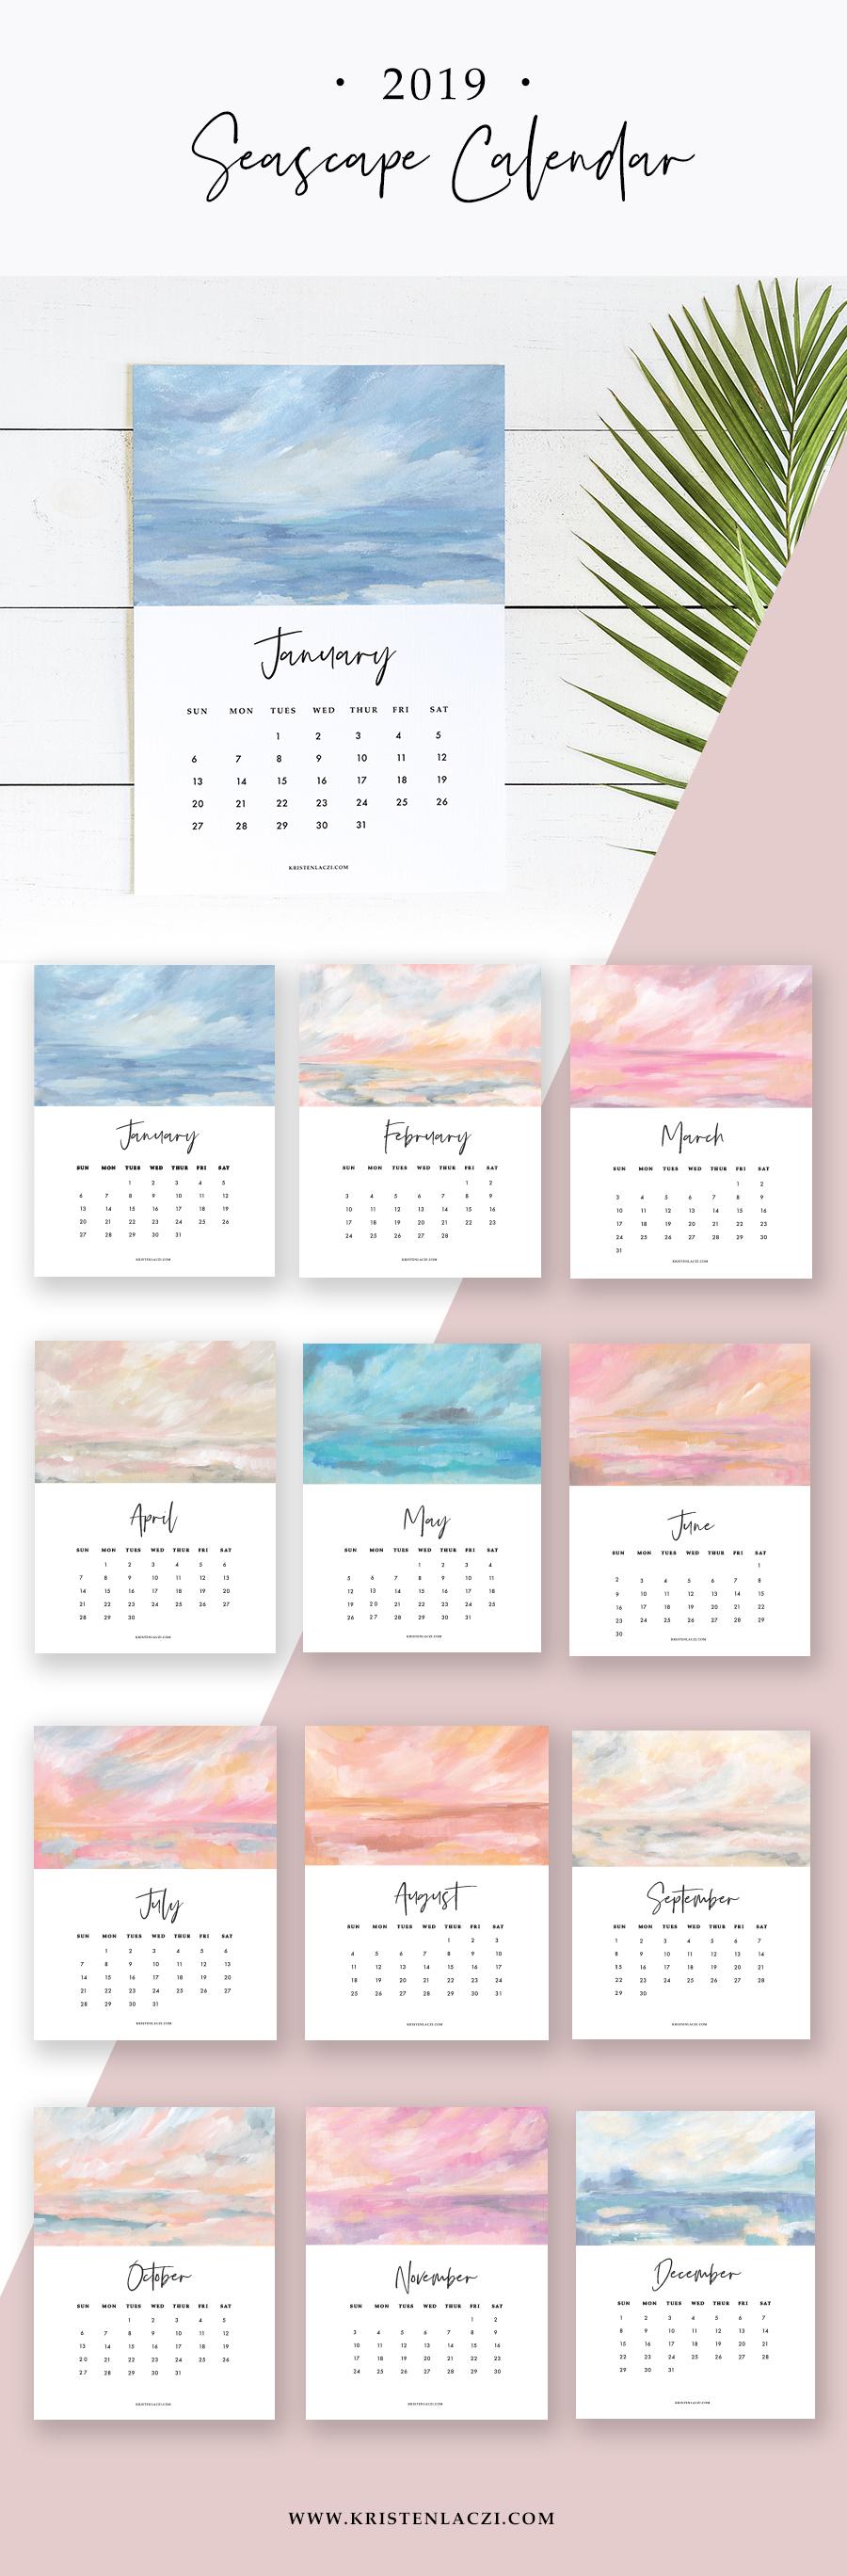 2019 Seascape Calendar by Kristen Laczi